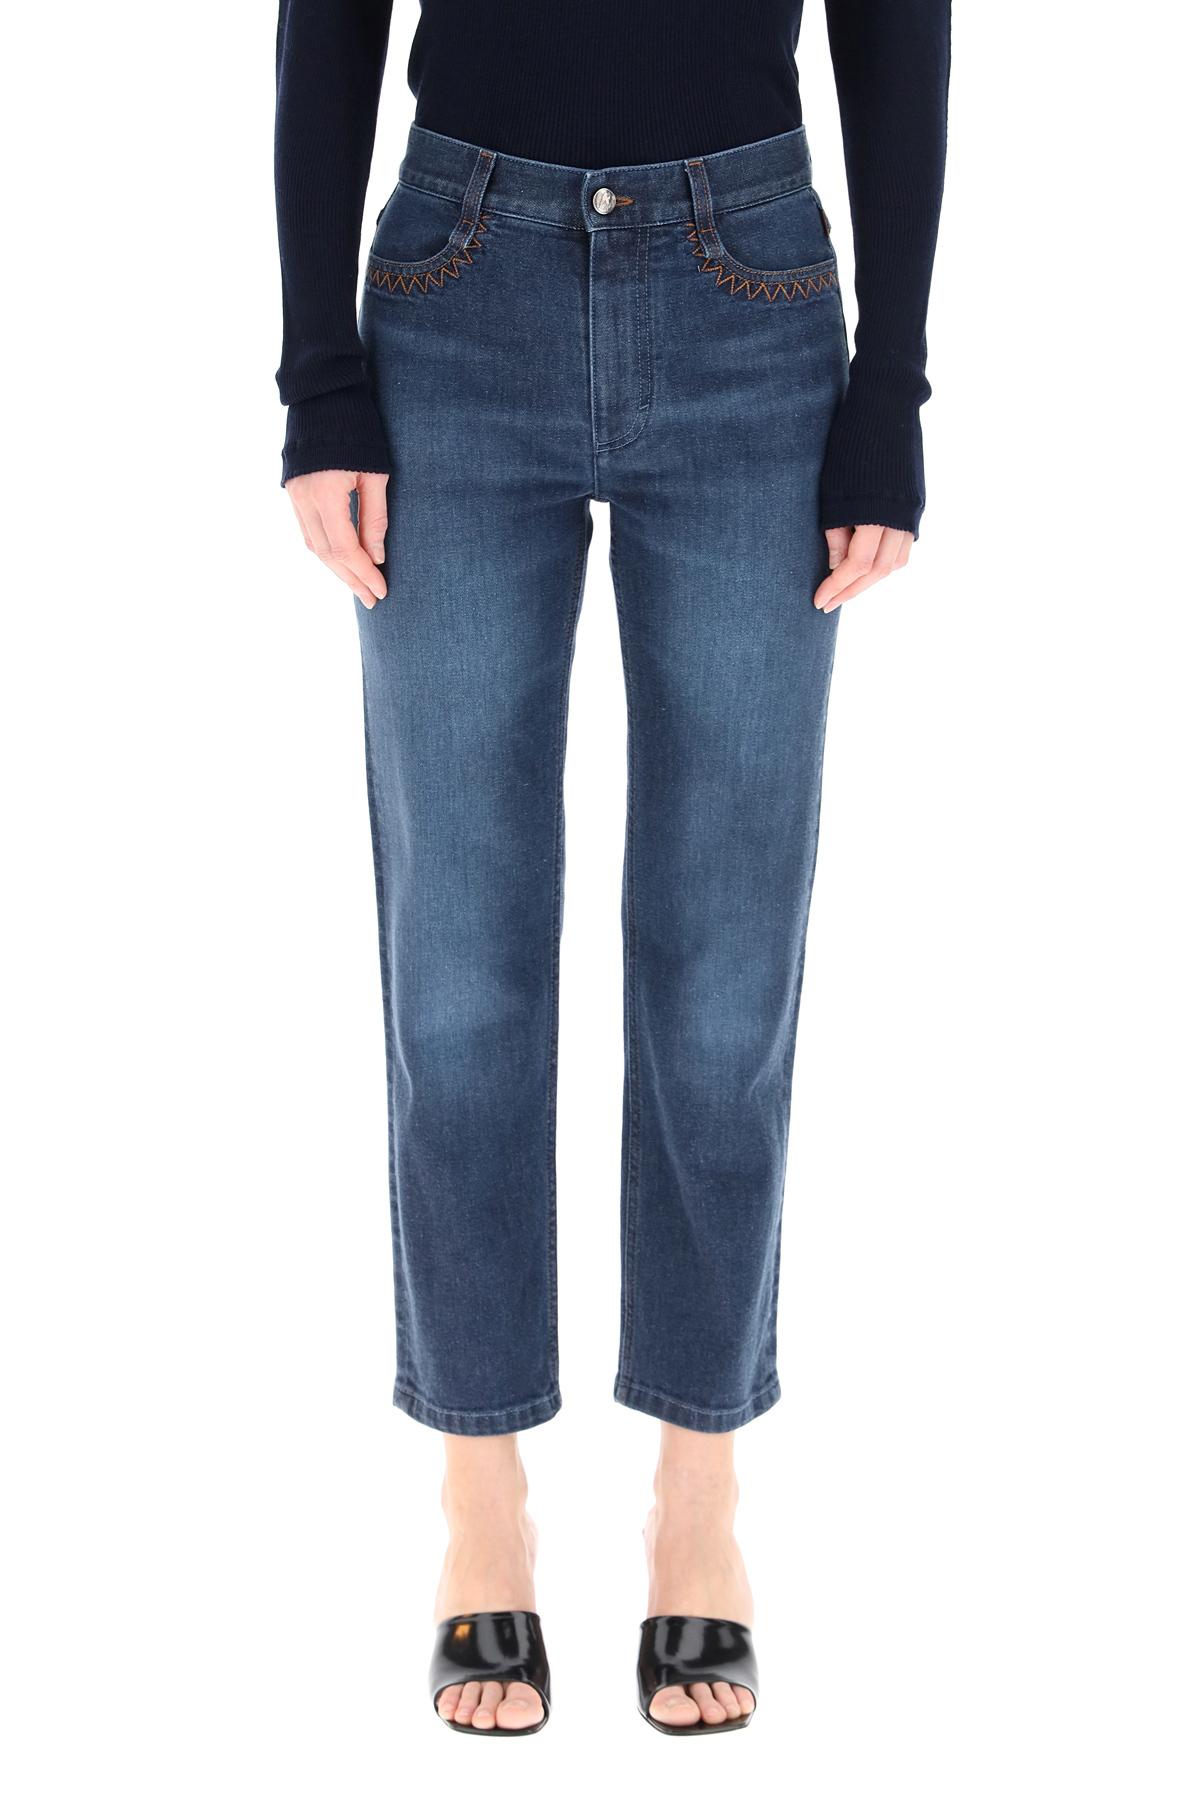 Chloe' jeans con logo a laser